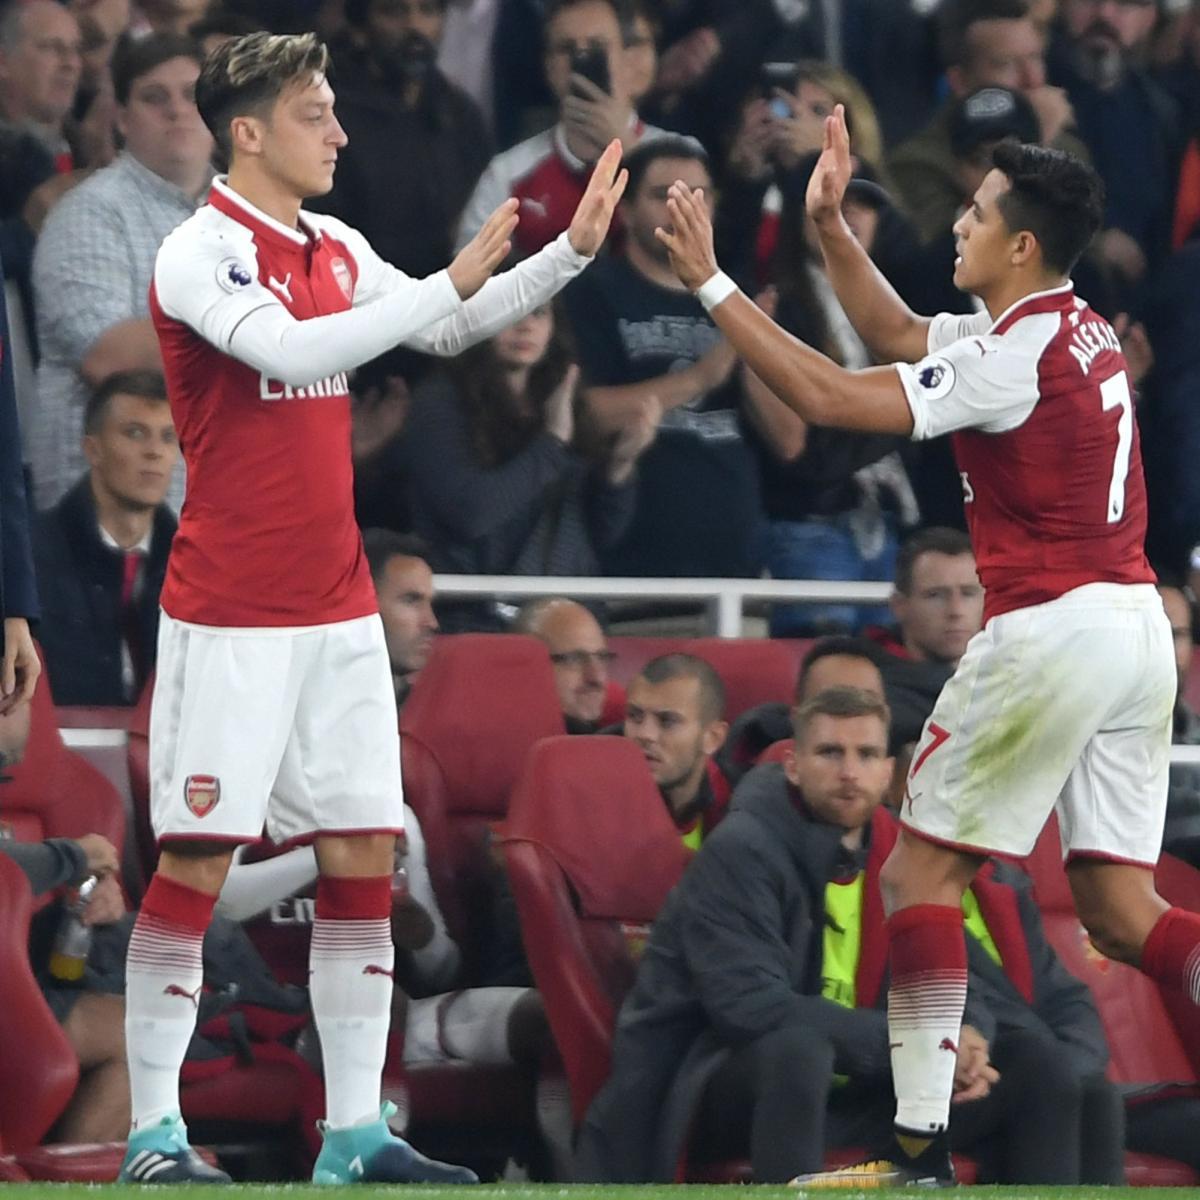 Manchester United Transfer News Alexis Sanchez Rumours: Arsenal Transfer News: Alexis Sanchez, Mesut Ozil Futures